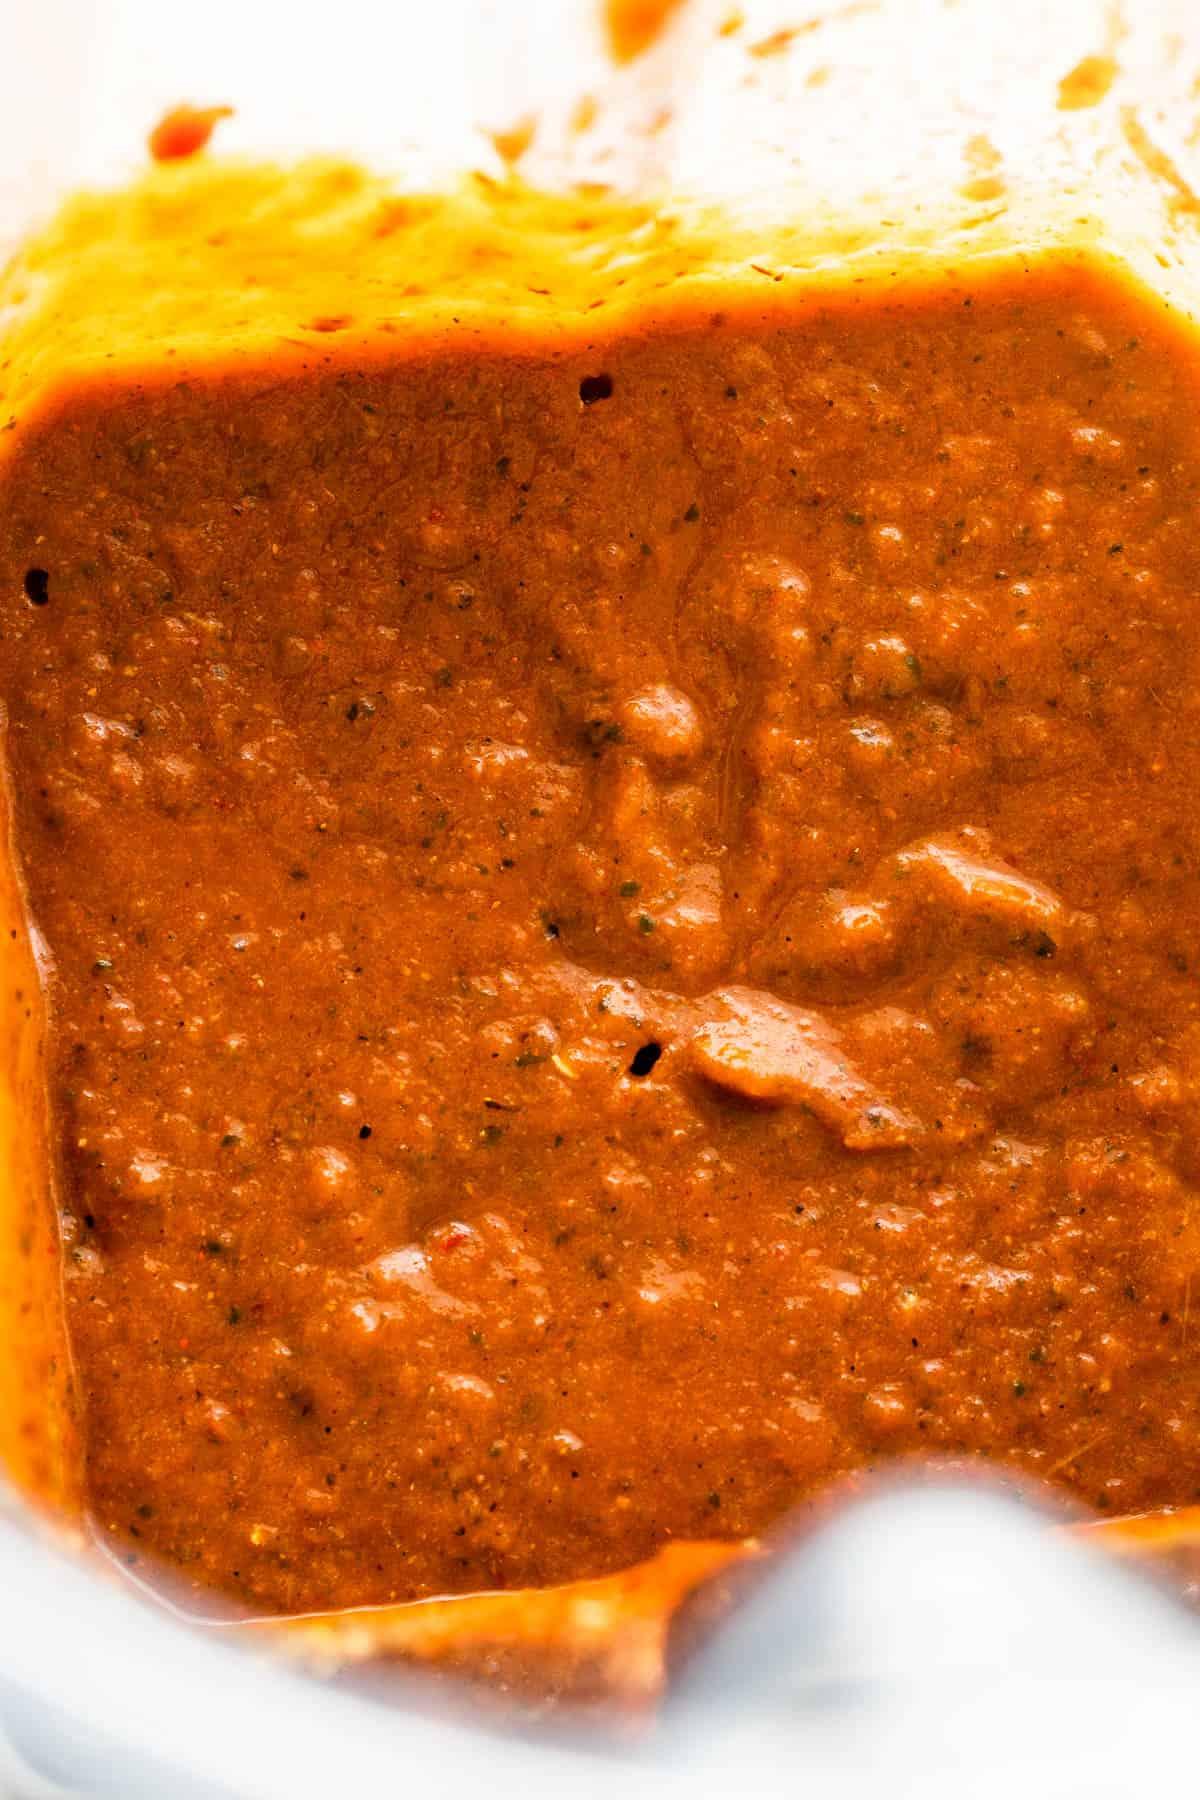 blended sofritas sauce